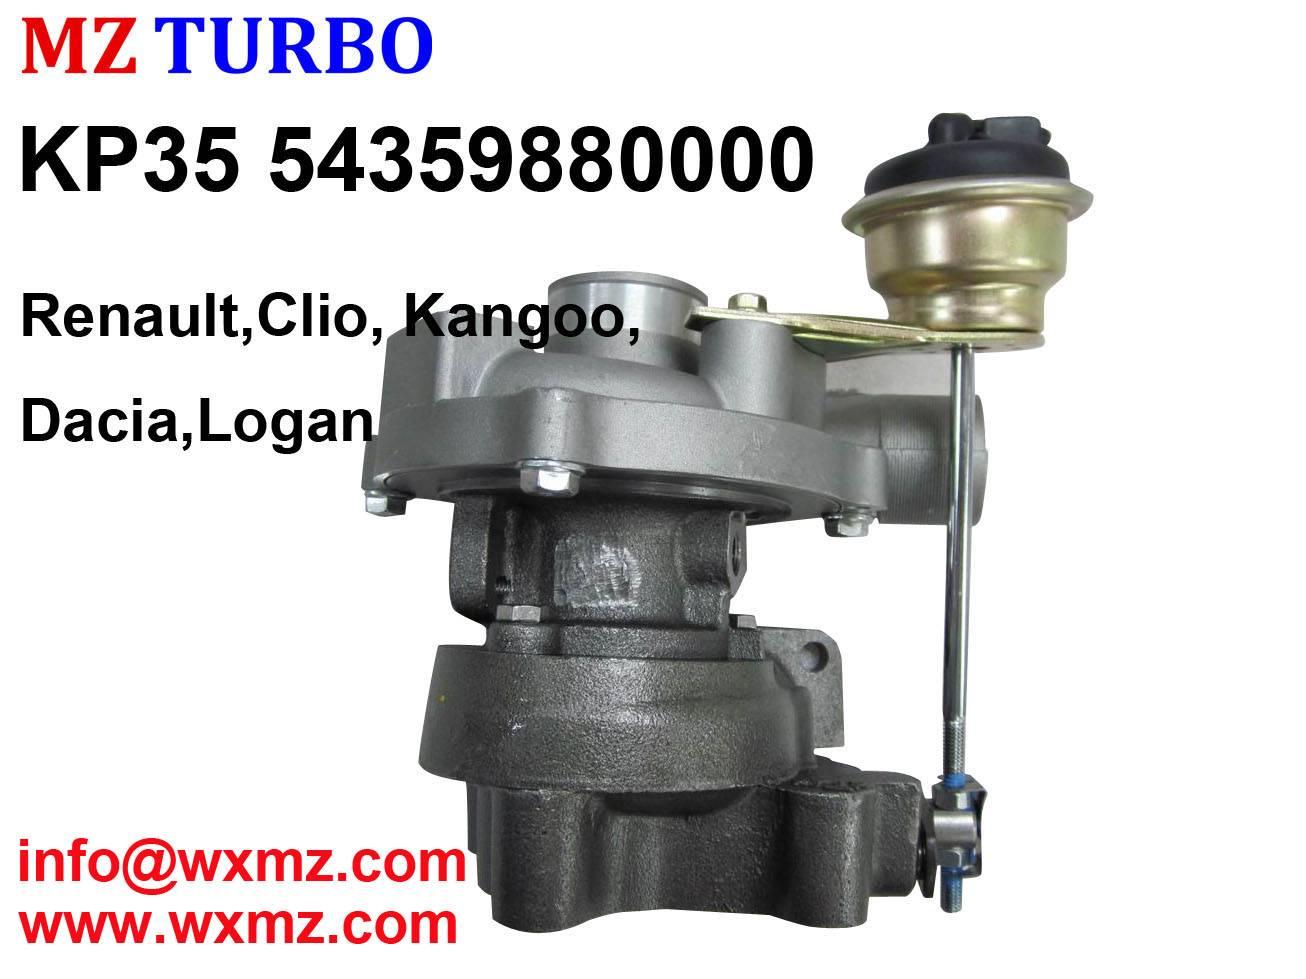 KP35 54359880000 Turbocharger suit for Renault, Clio, Kangoo, Dacia, Logan